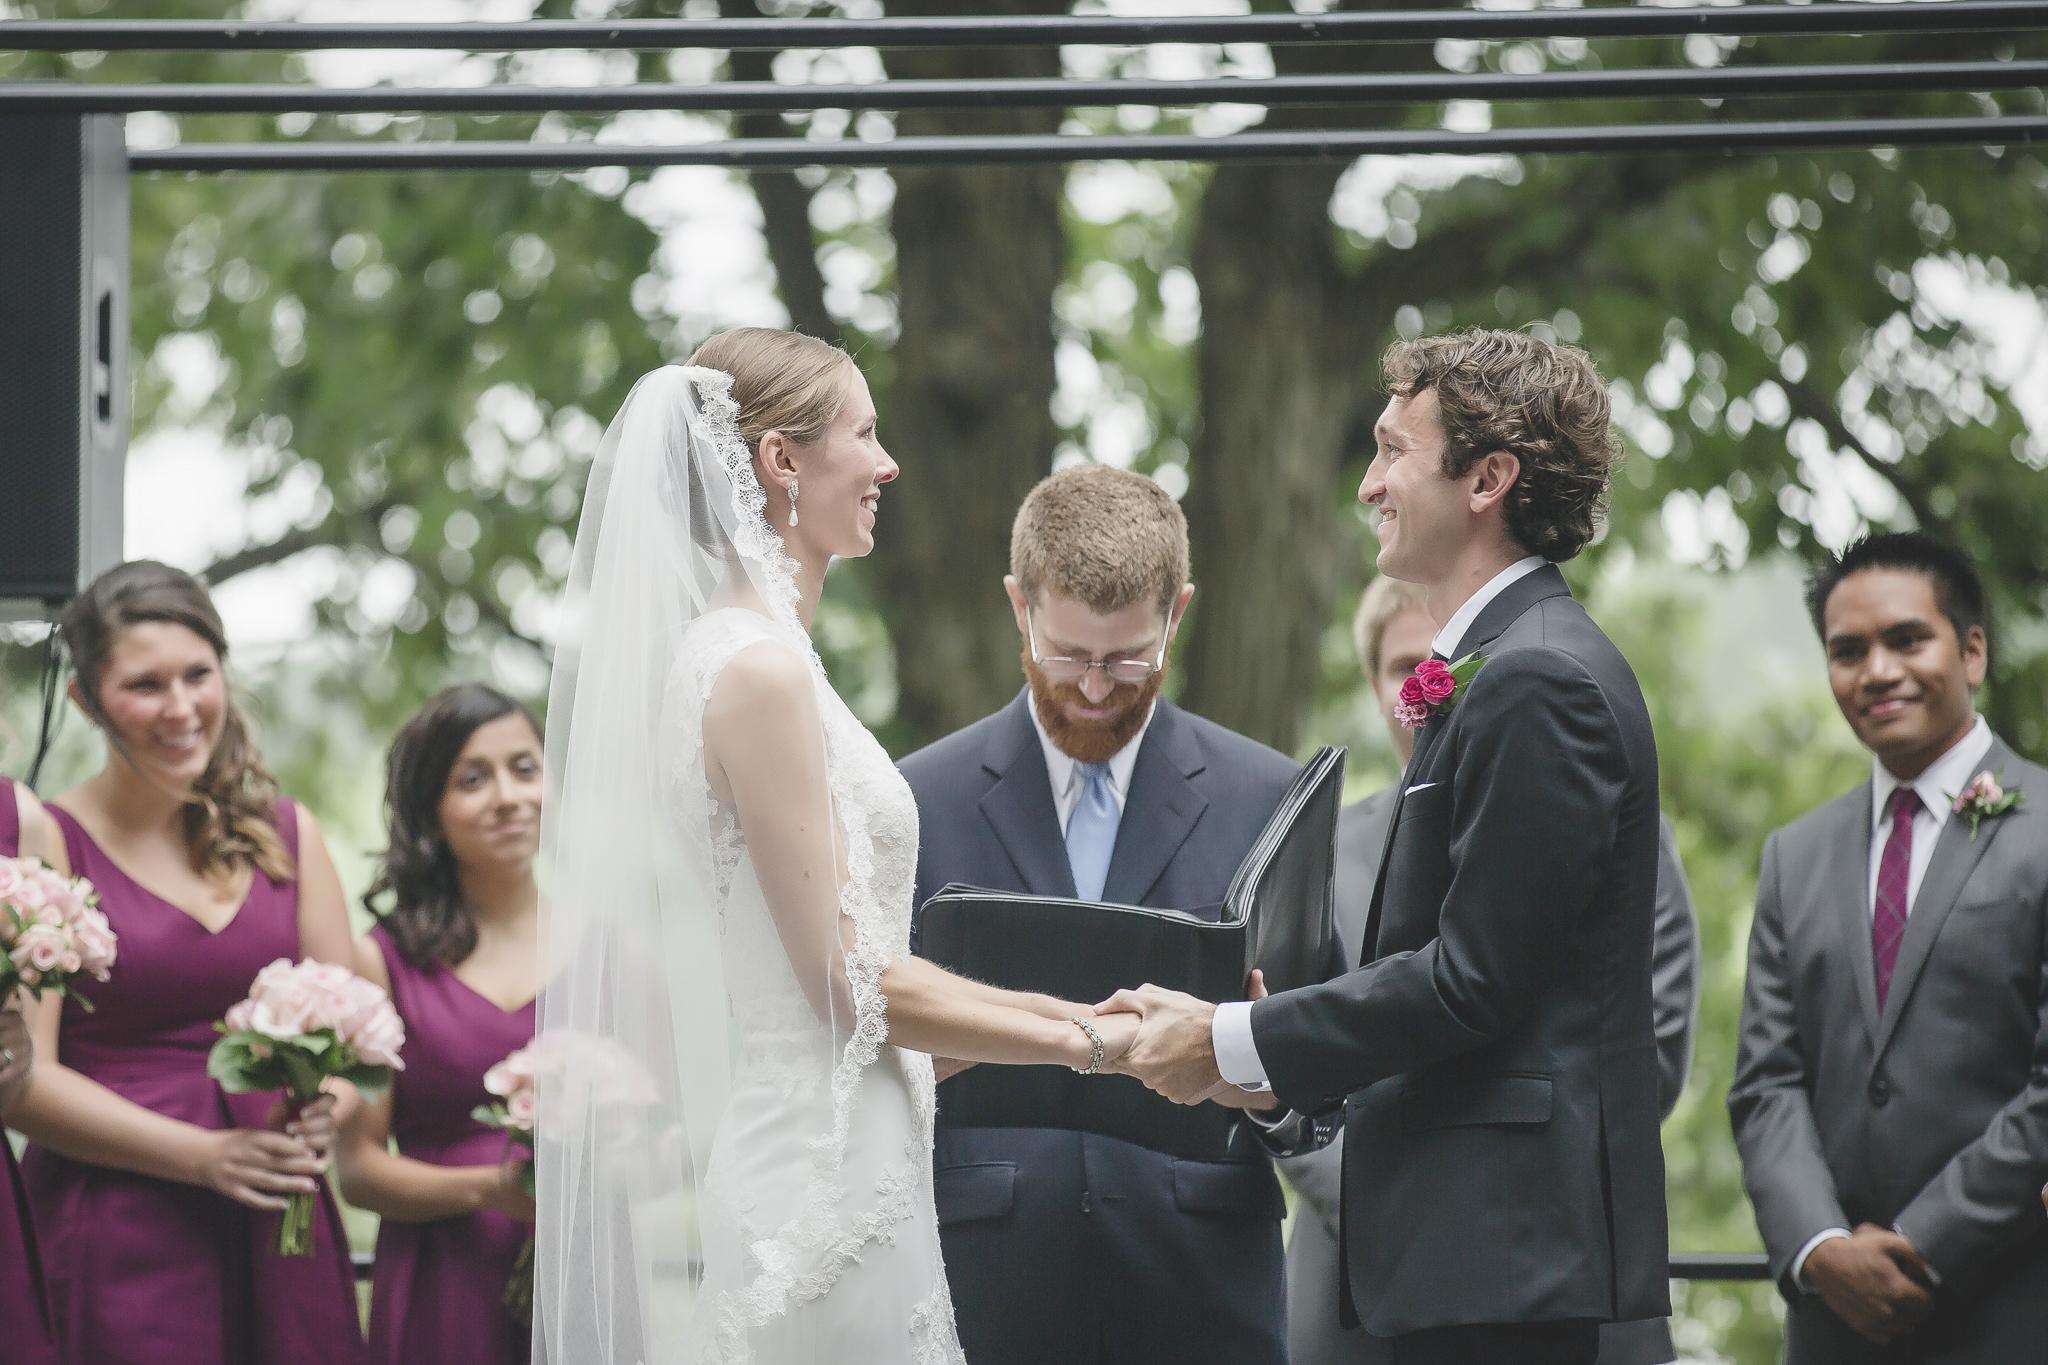 james j hill library wedding photography-14.jpg